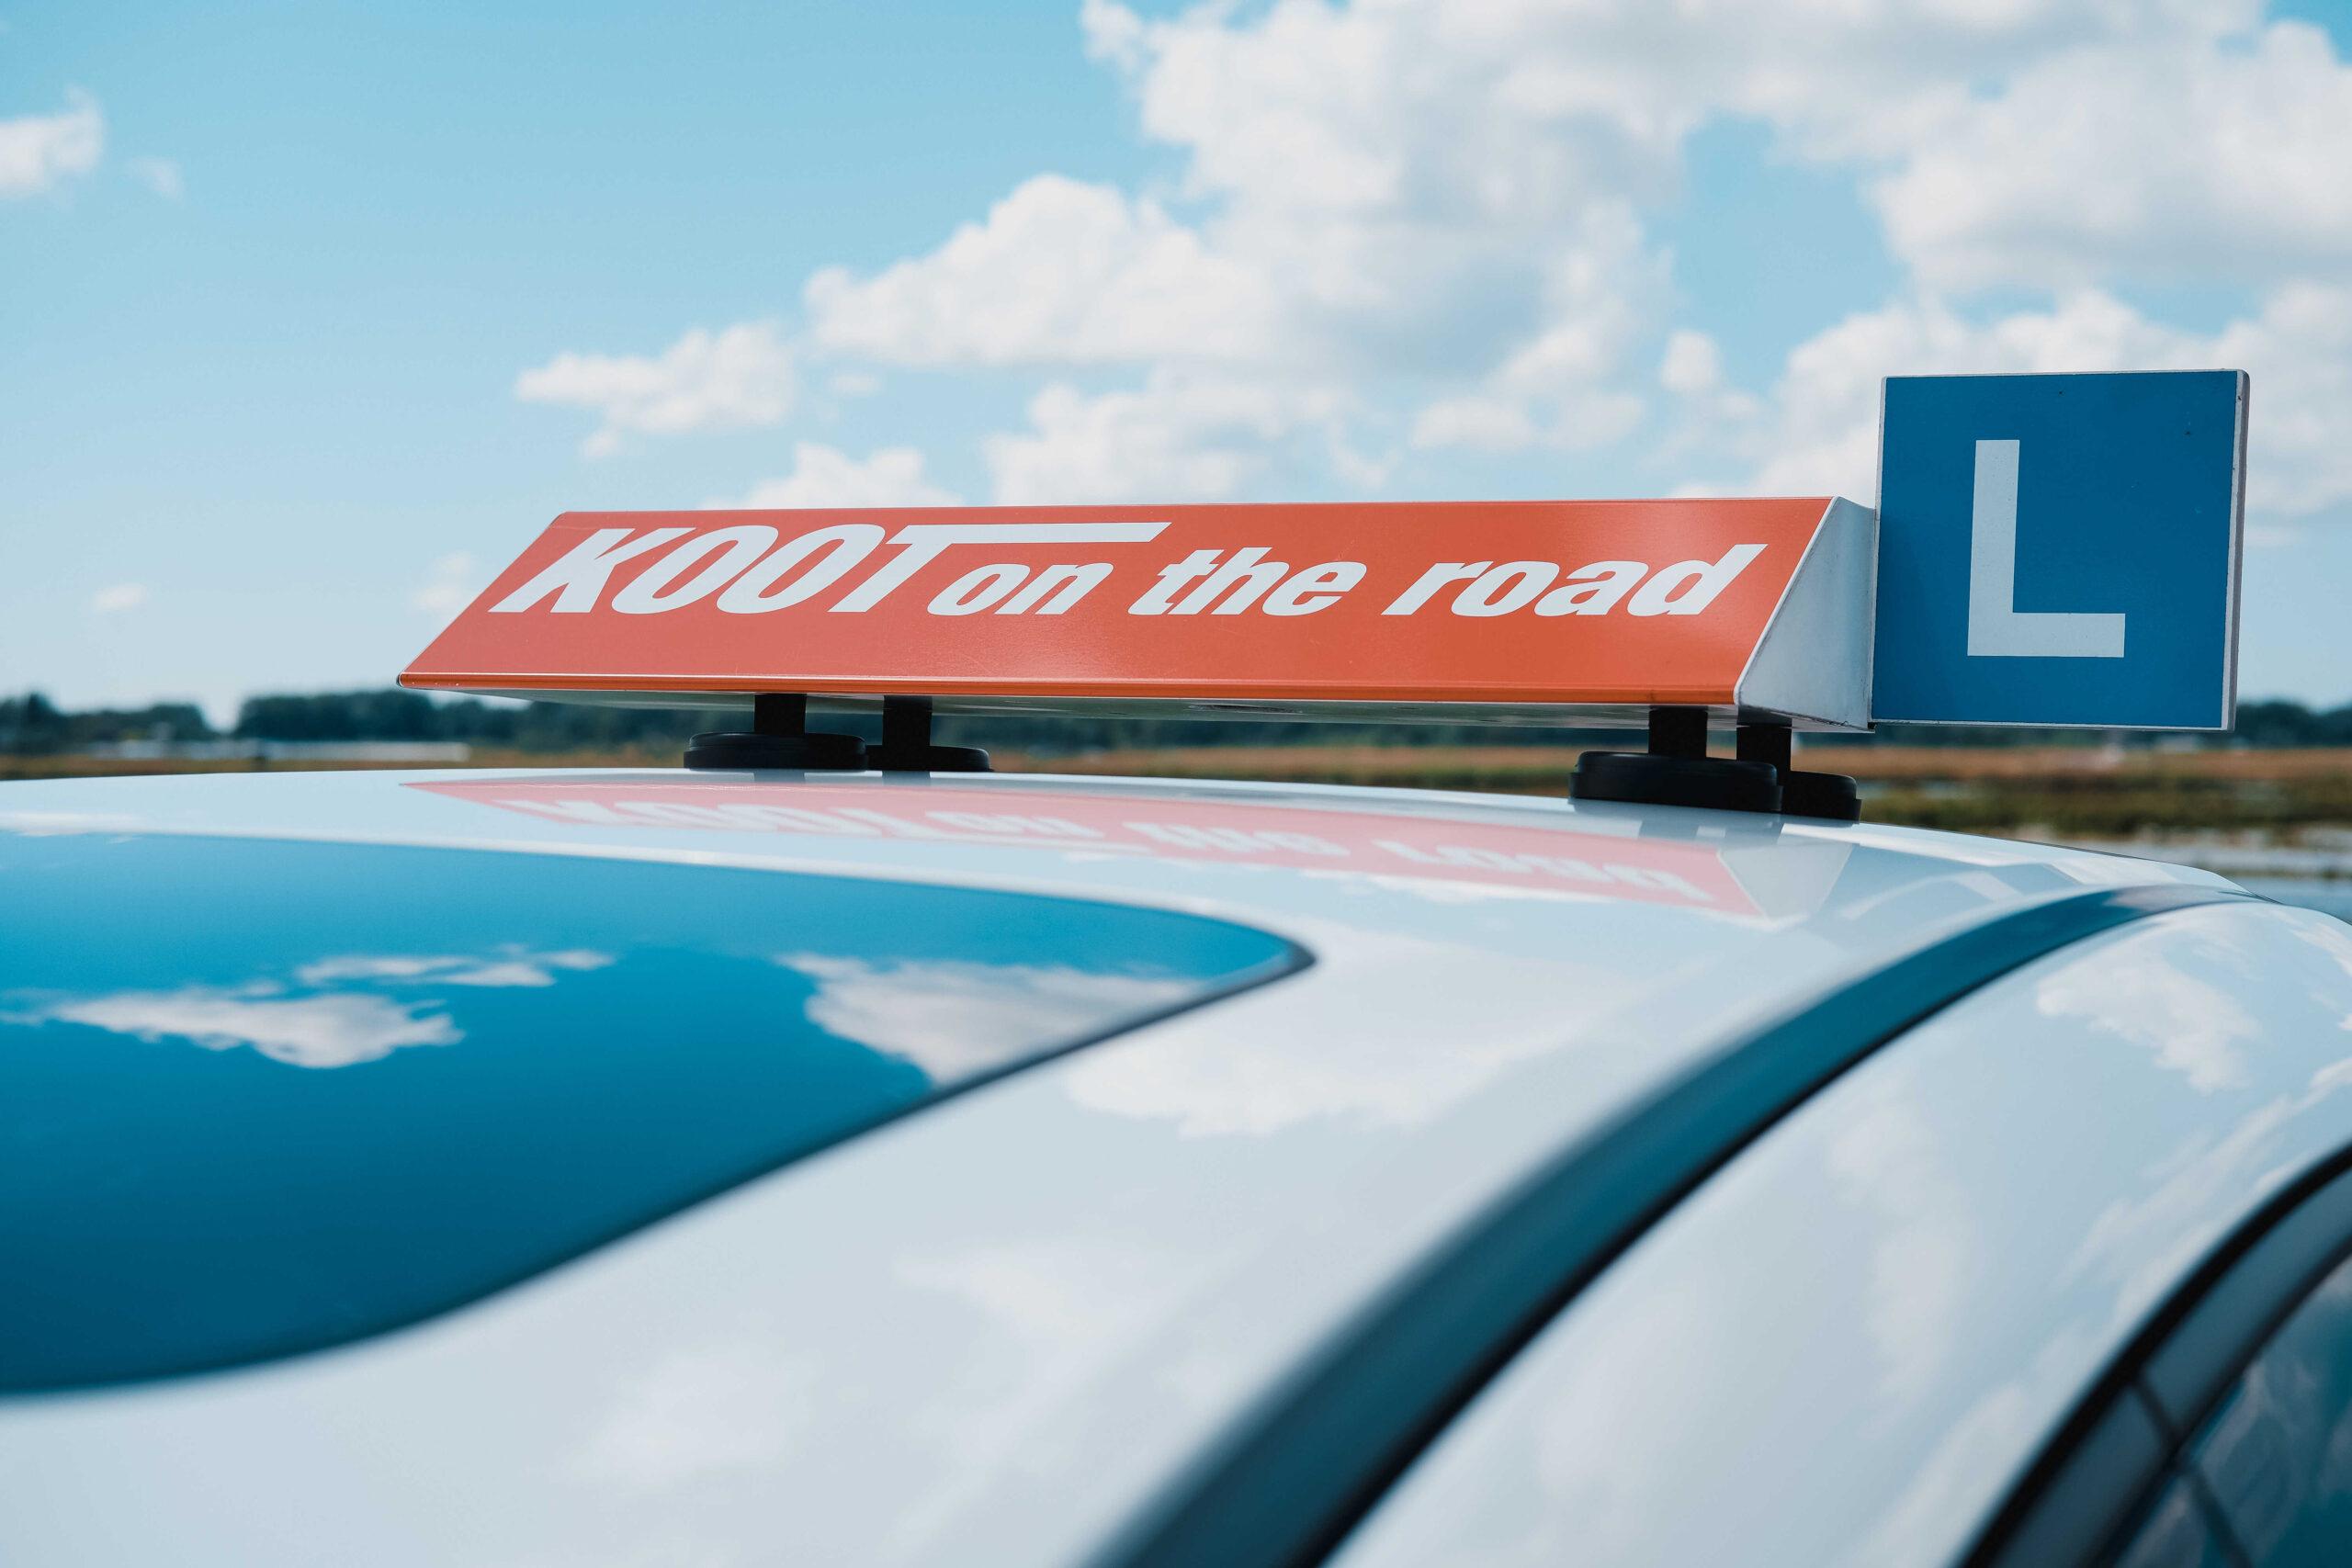 Foto's laten maken koot on the road